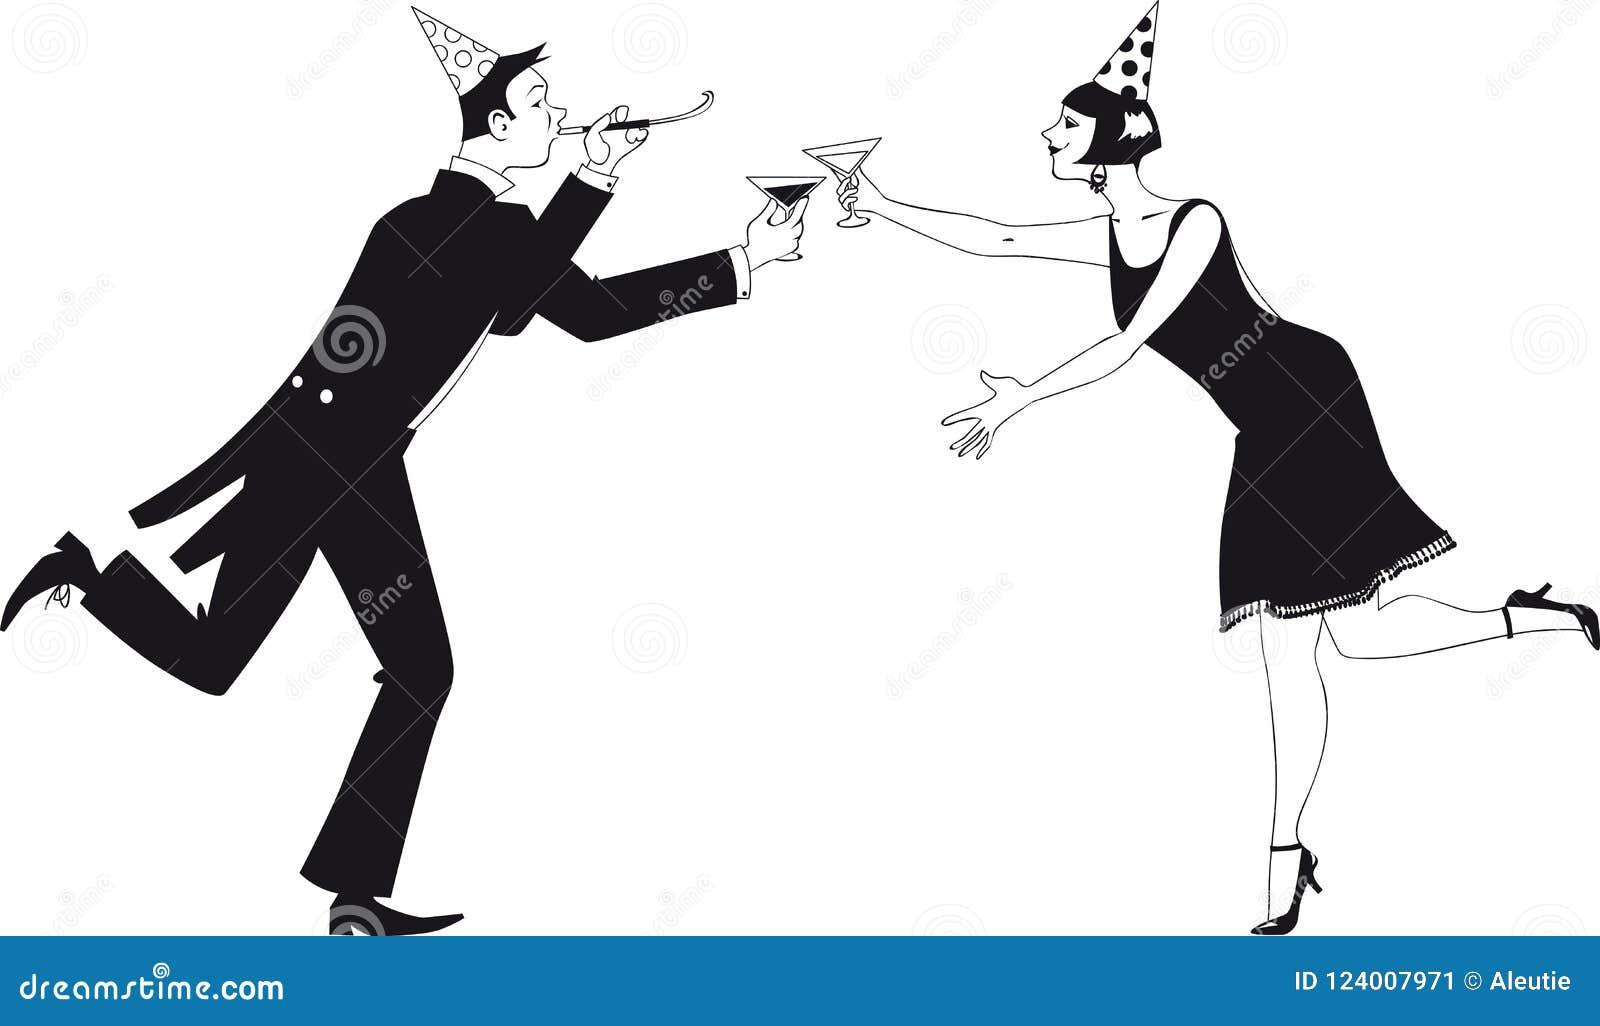 Happy new year toast stock vector. Illustration of drinking - 124007971